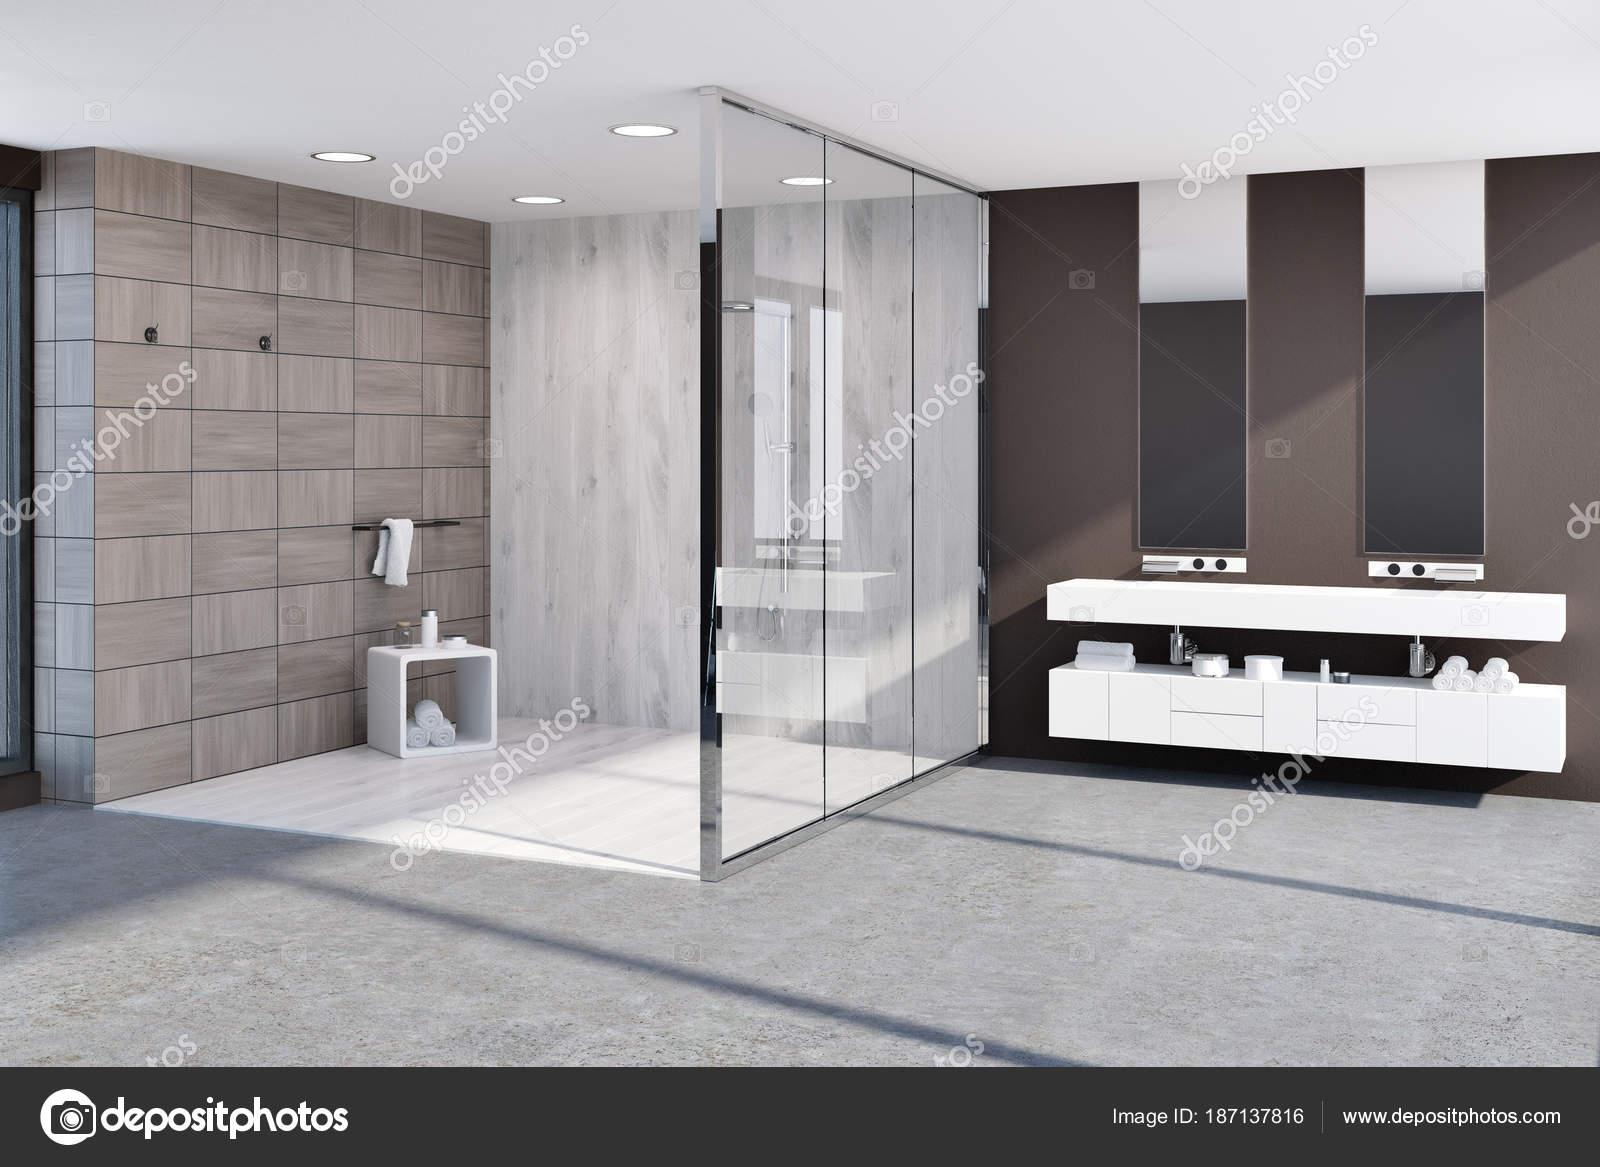 Badkamer Tegels Bruin : Houten tegels bruin badkamer hoek u stockfoto denisismagilov